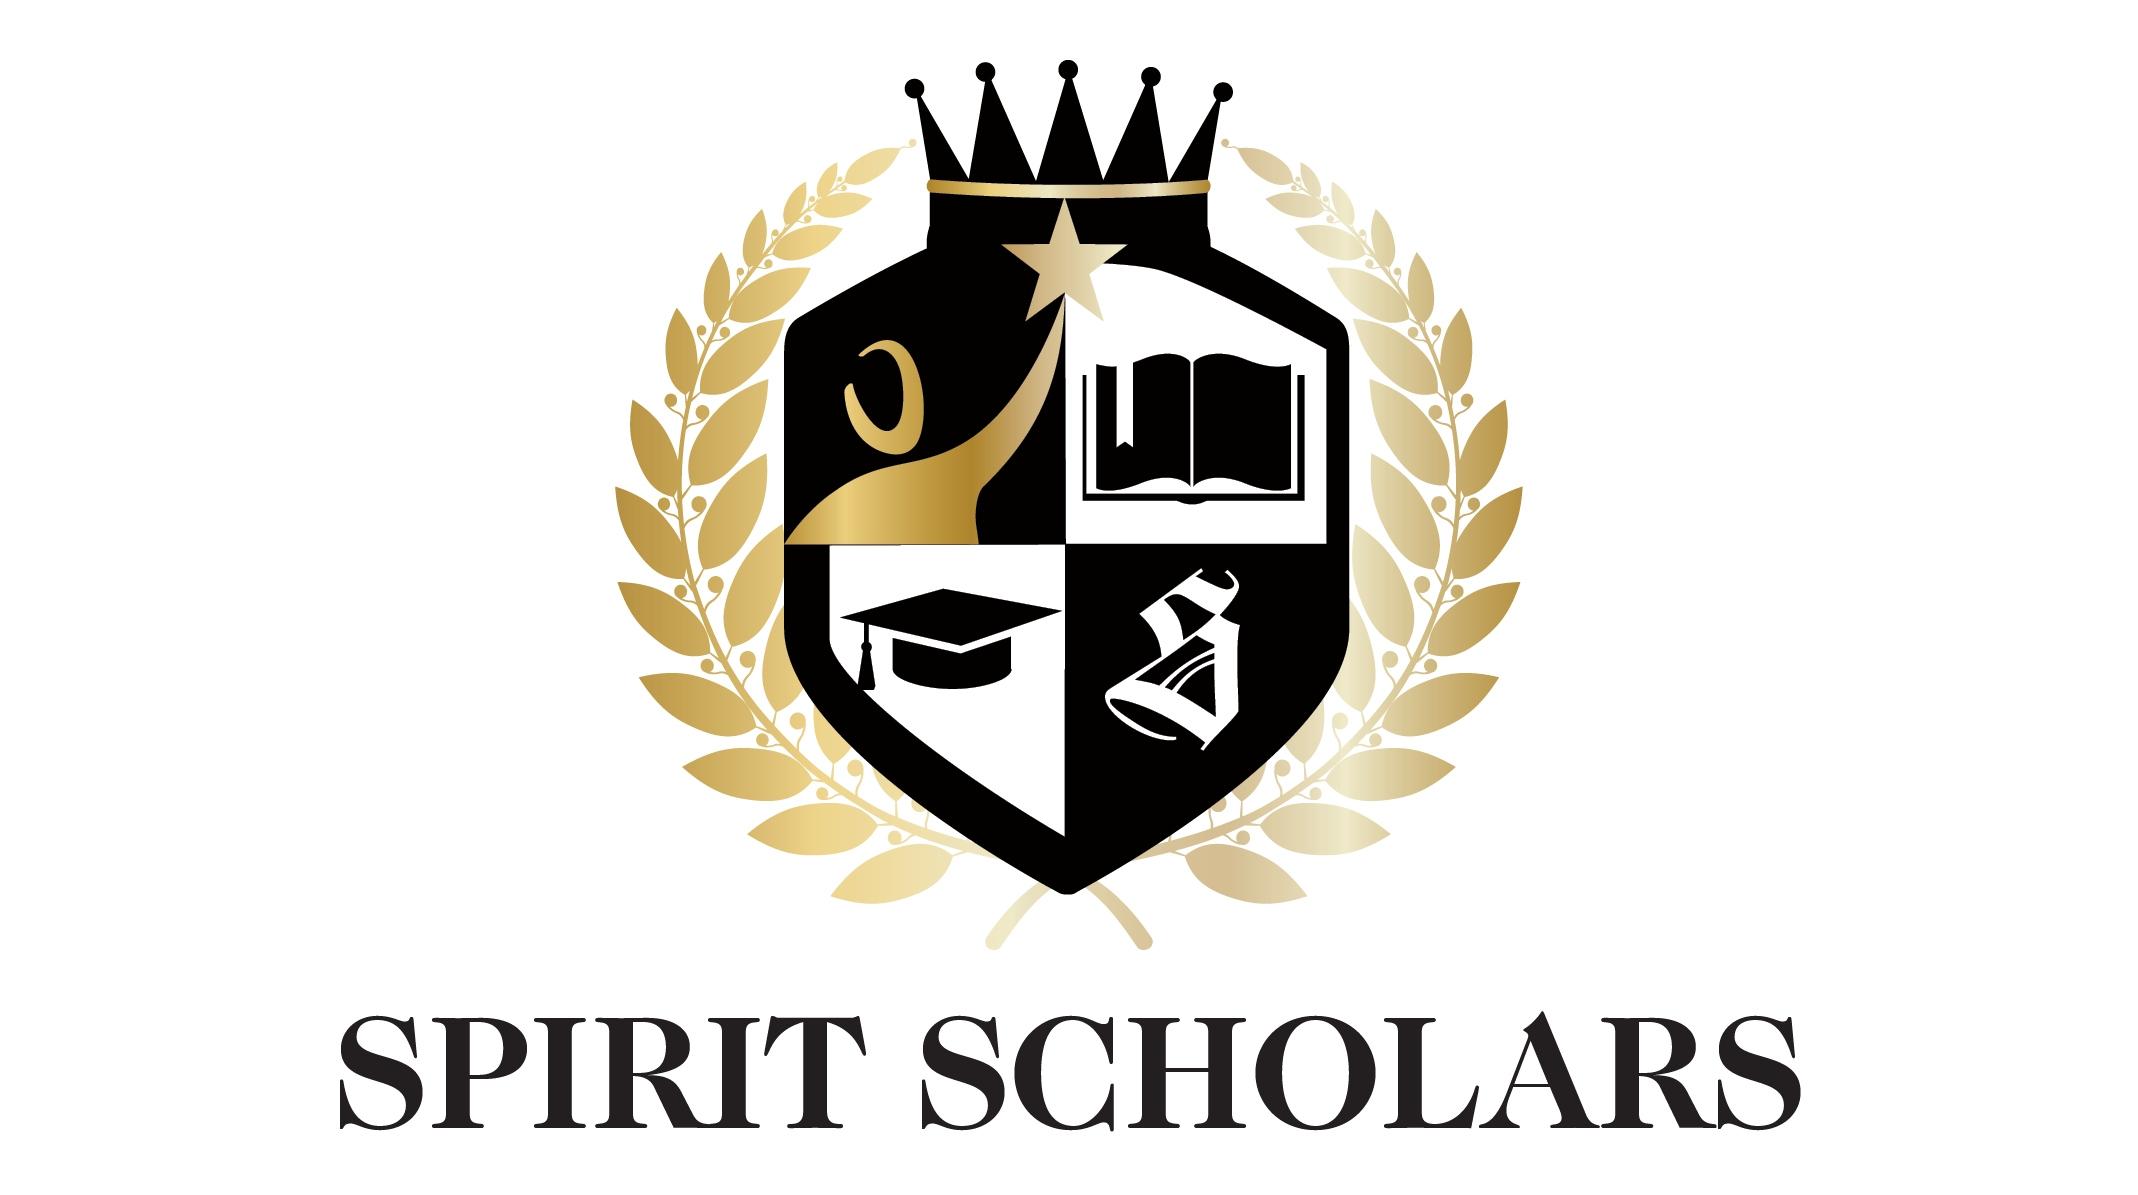 Spirit Scholars logo